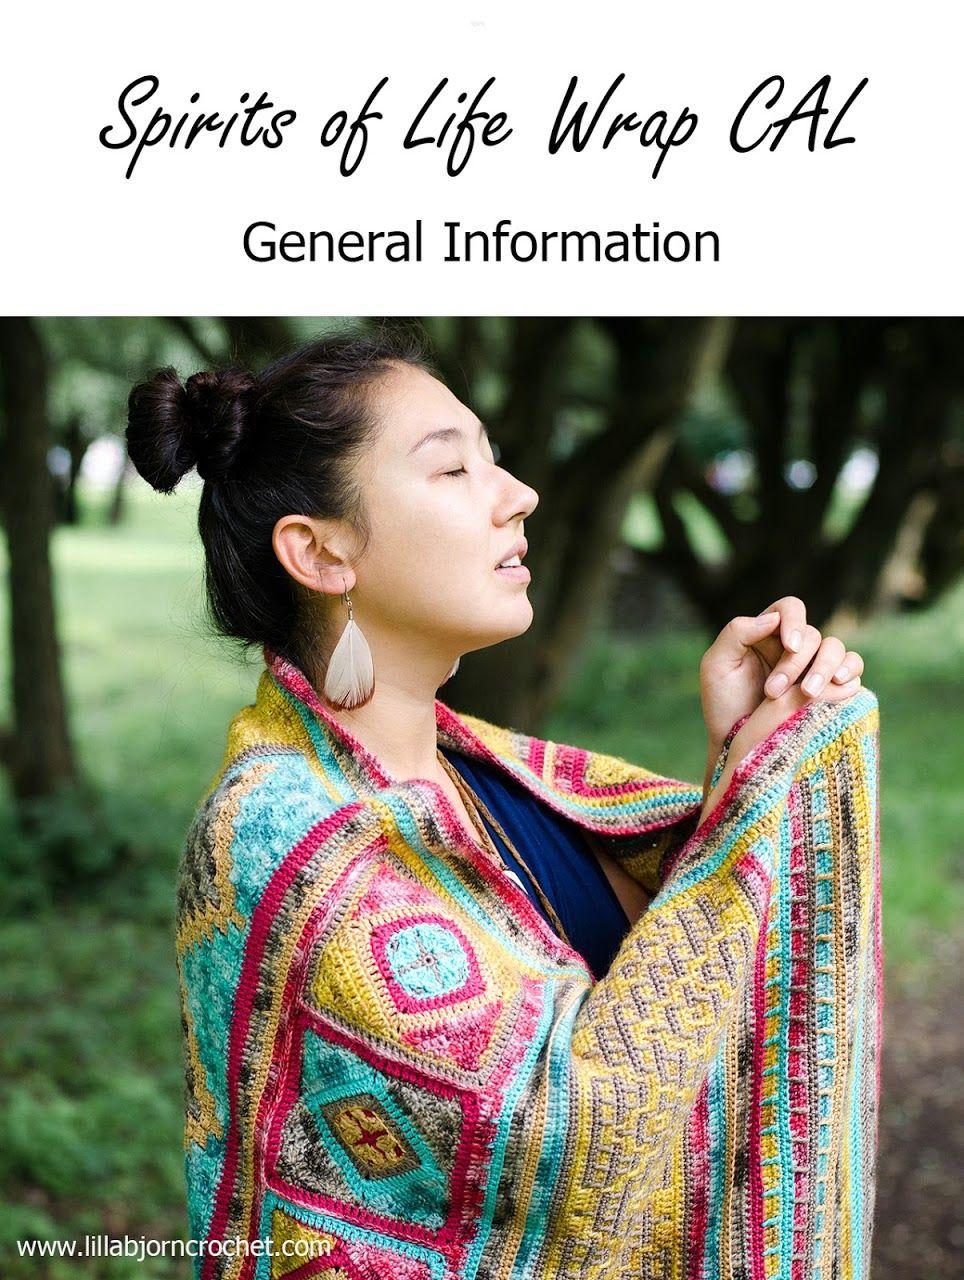 Spirits of Life Wrap CAL: General Information   Häkelanleitung ...